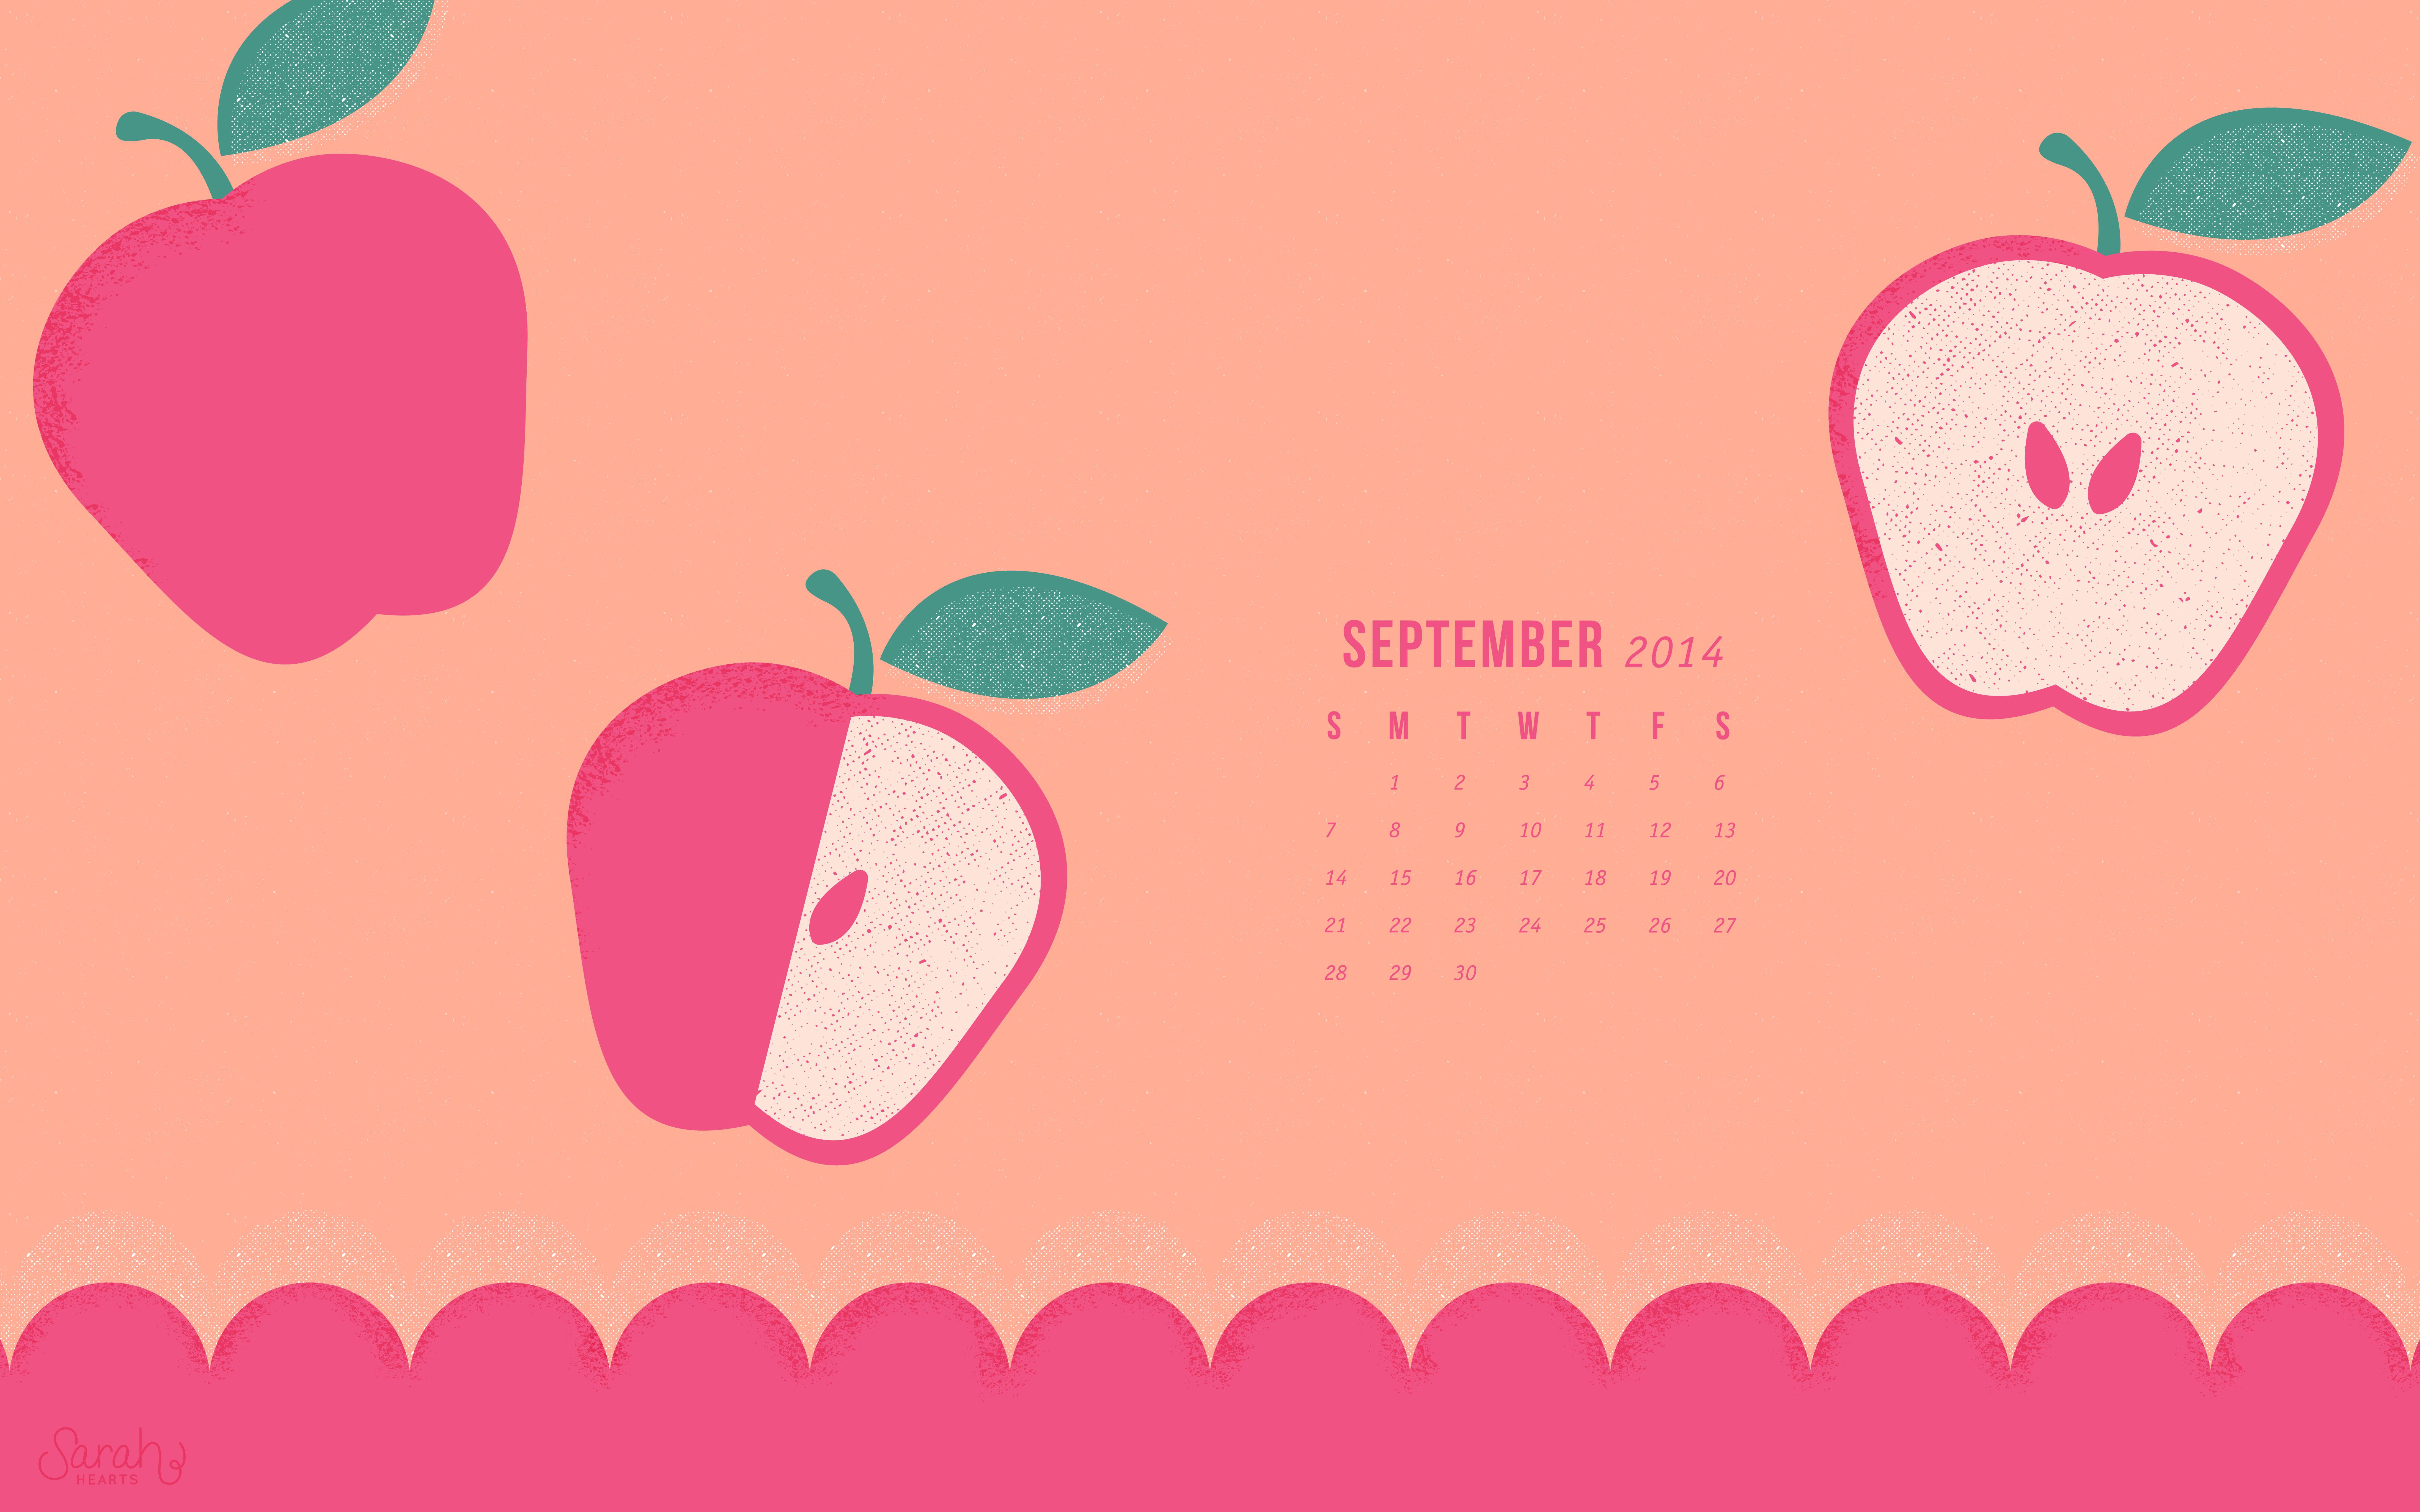 September 2014 Calendar Wallpaper